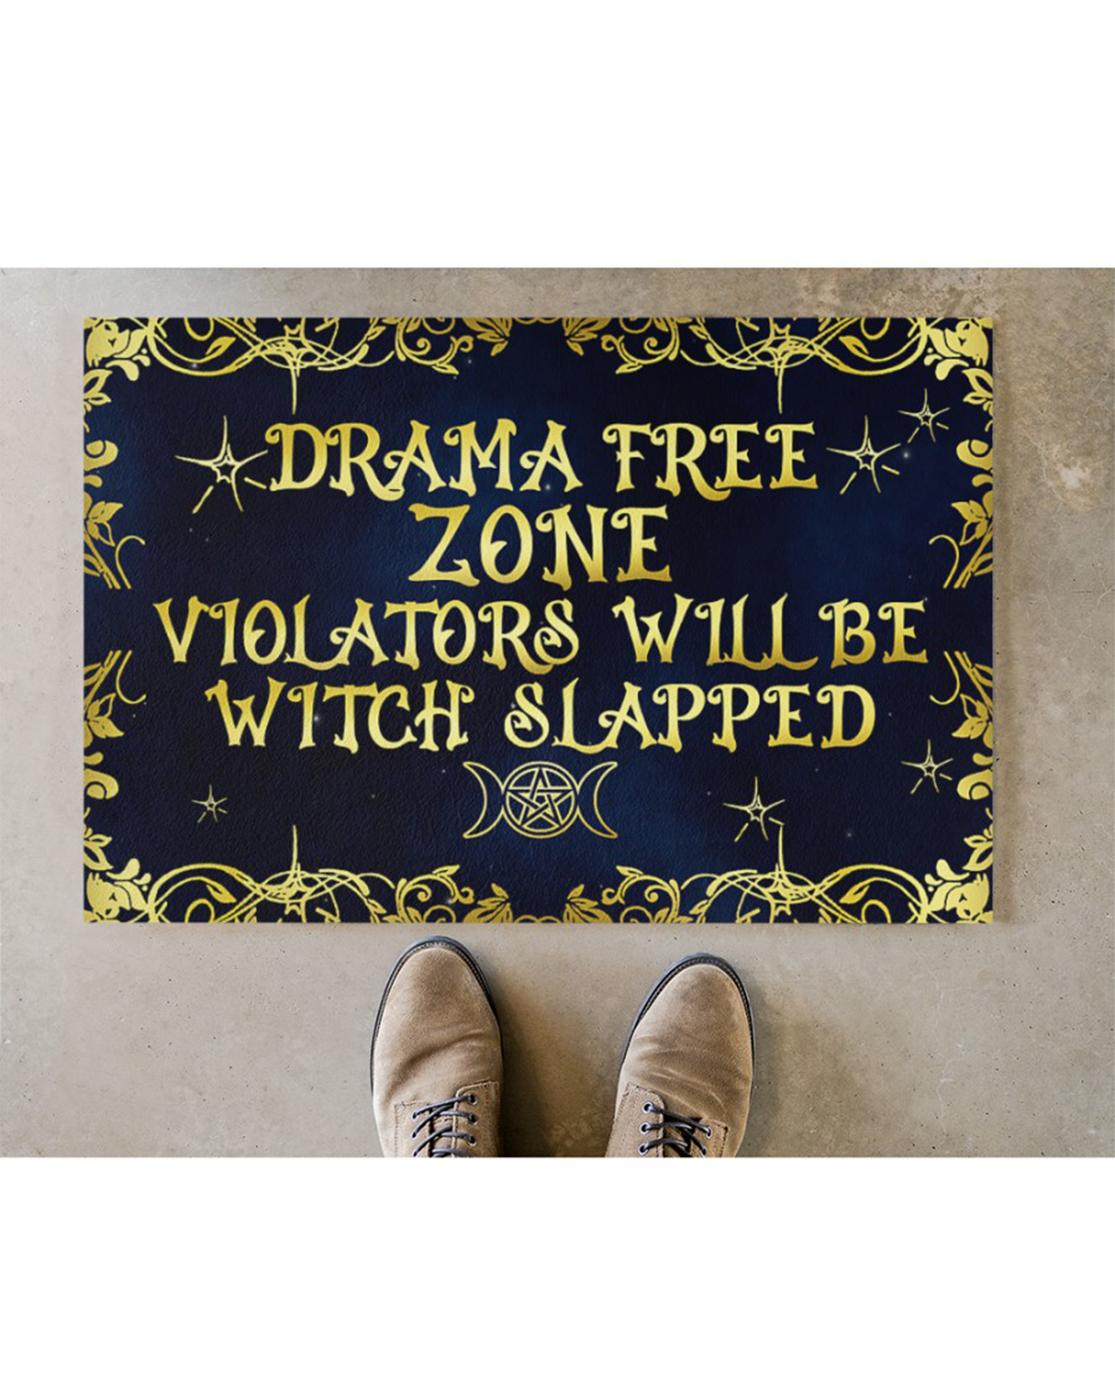 Drama free zone violators will be witch slapped doormat